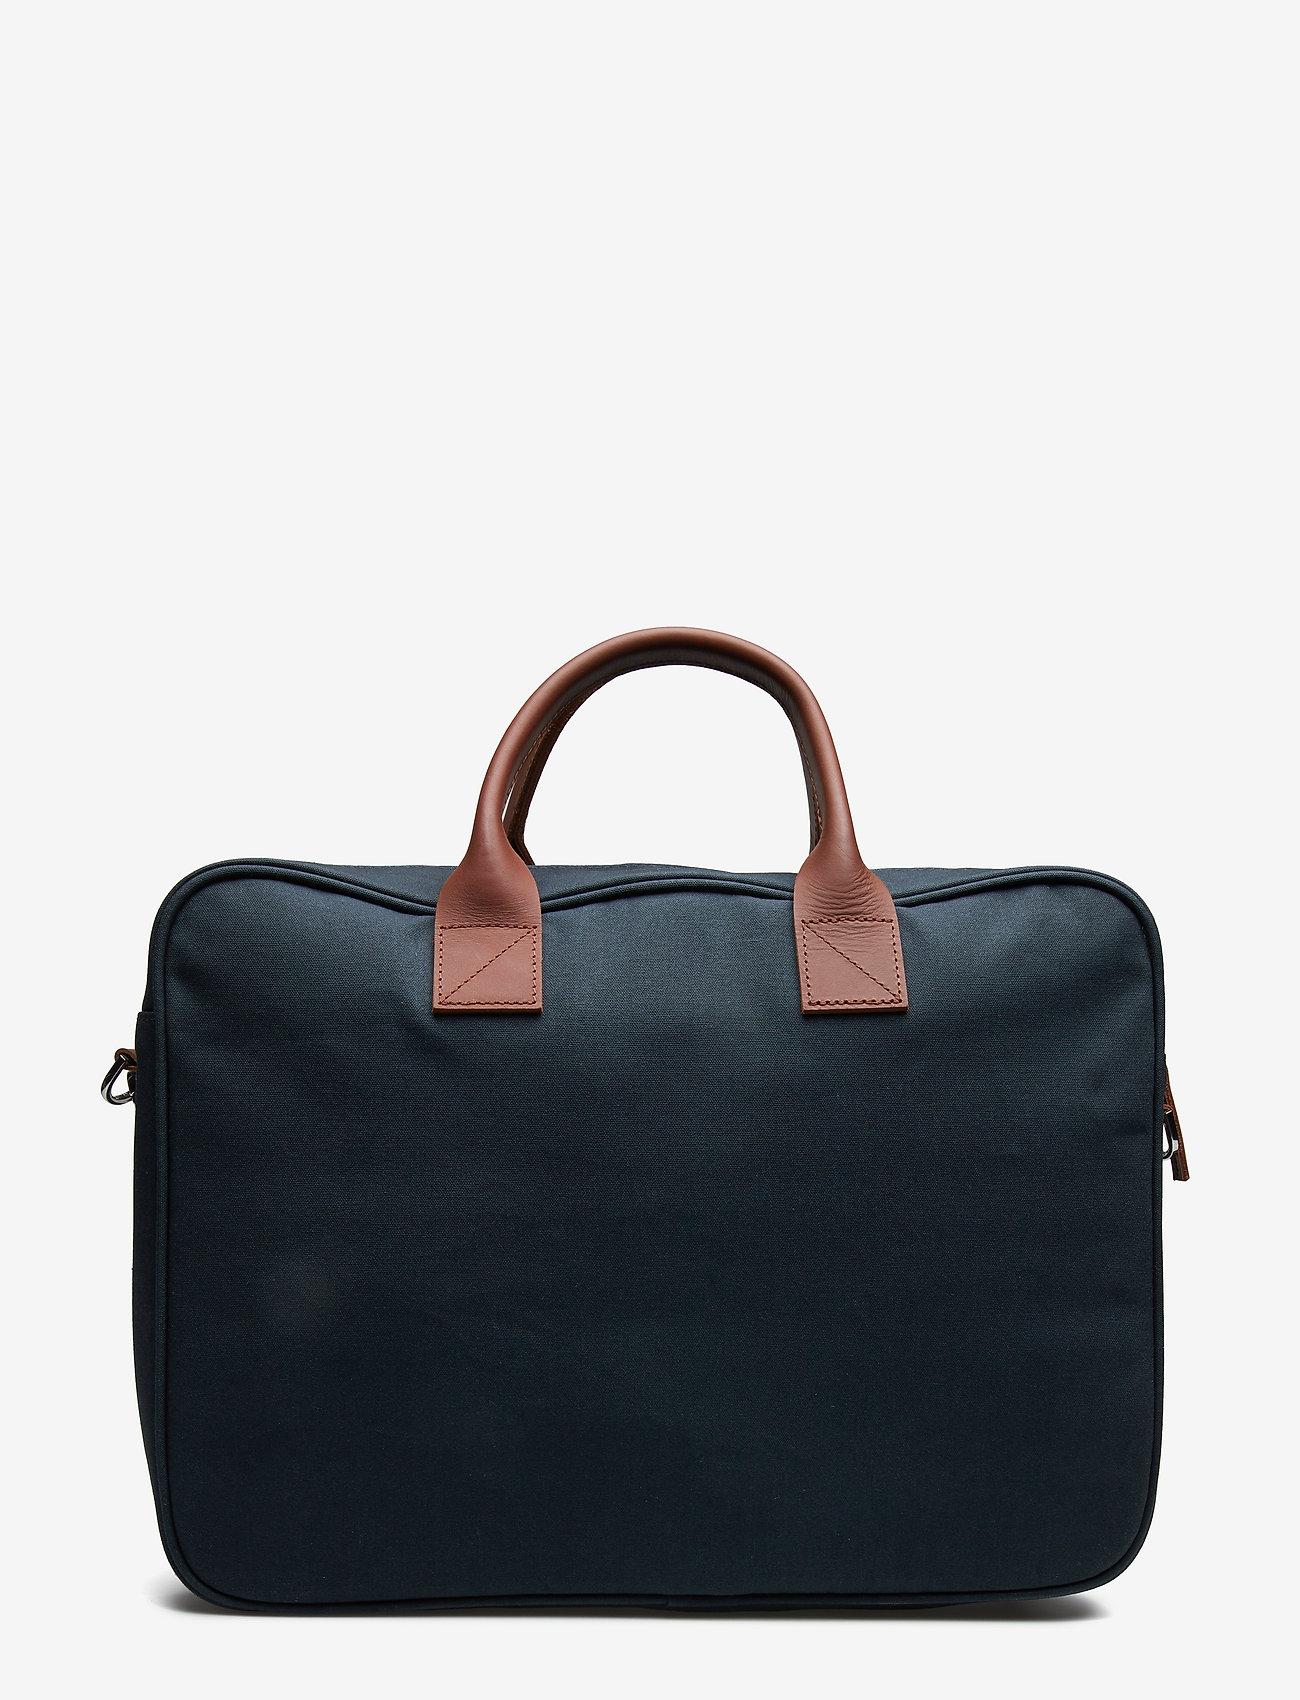 SANDQVIST - EMIL - navy with cognac brown leather - 2